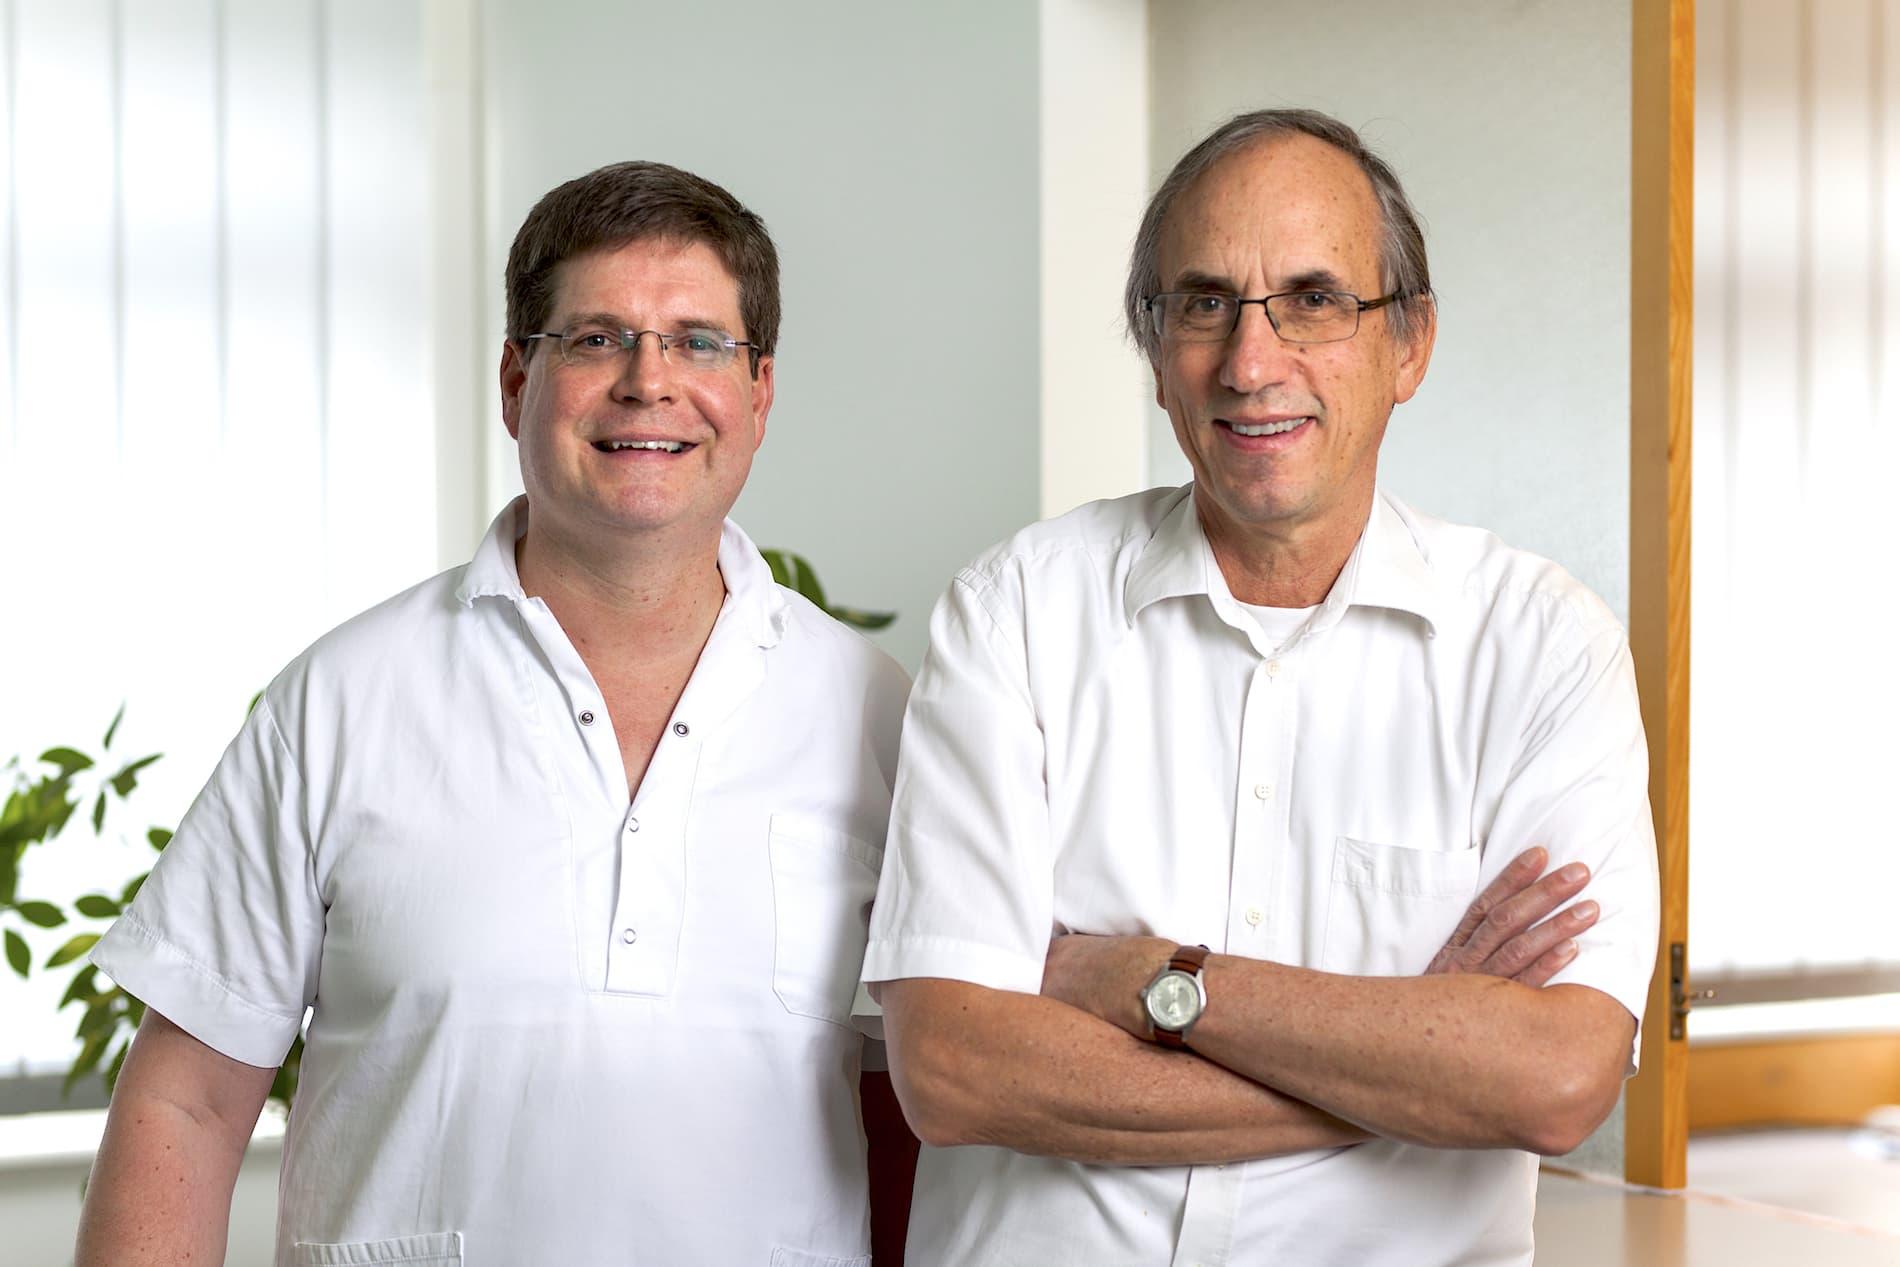 Dr. Martin Dellas & Dr. Arthur Mensdorff-Pouilly